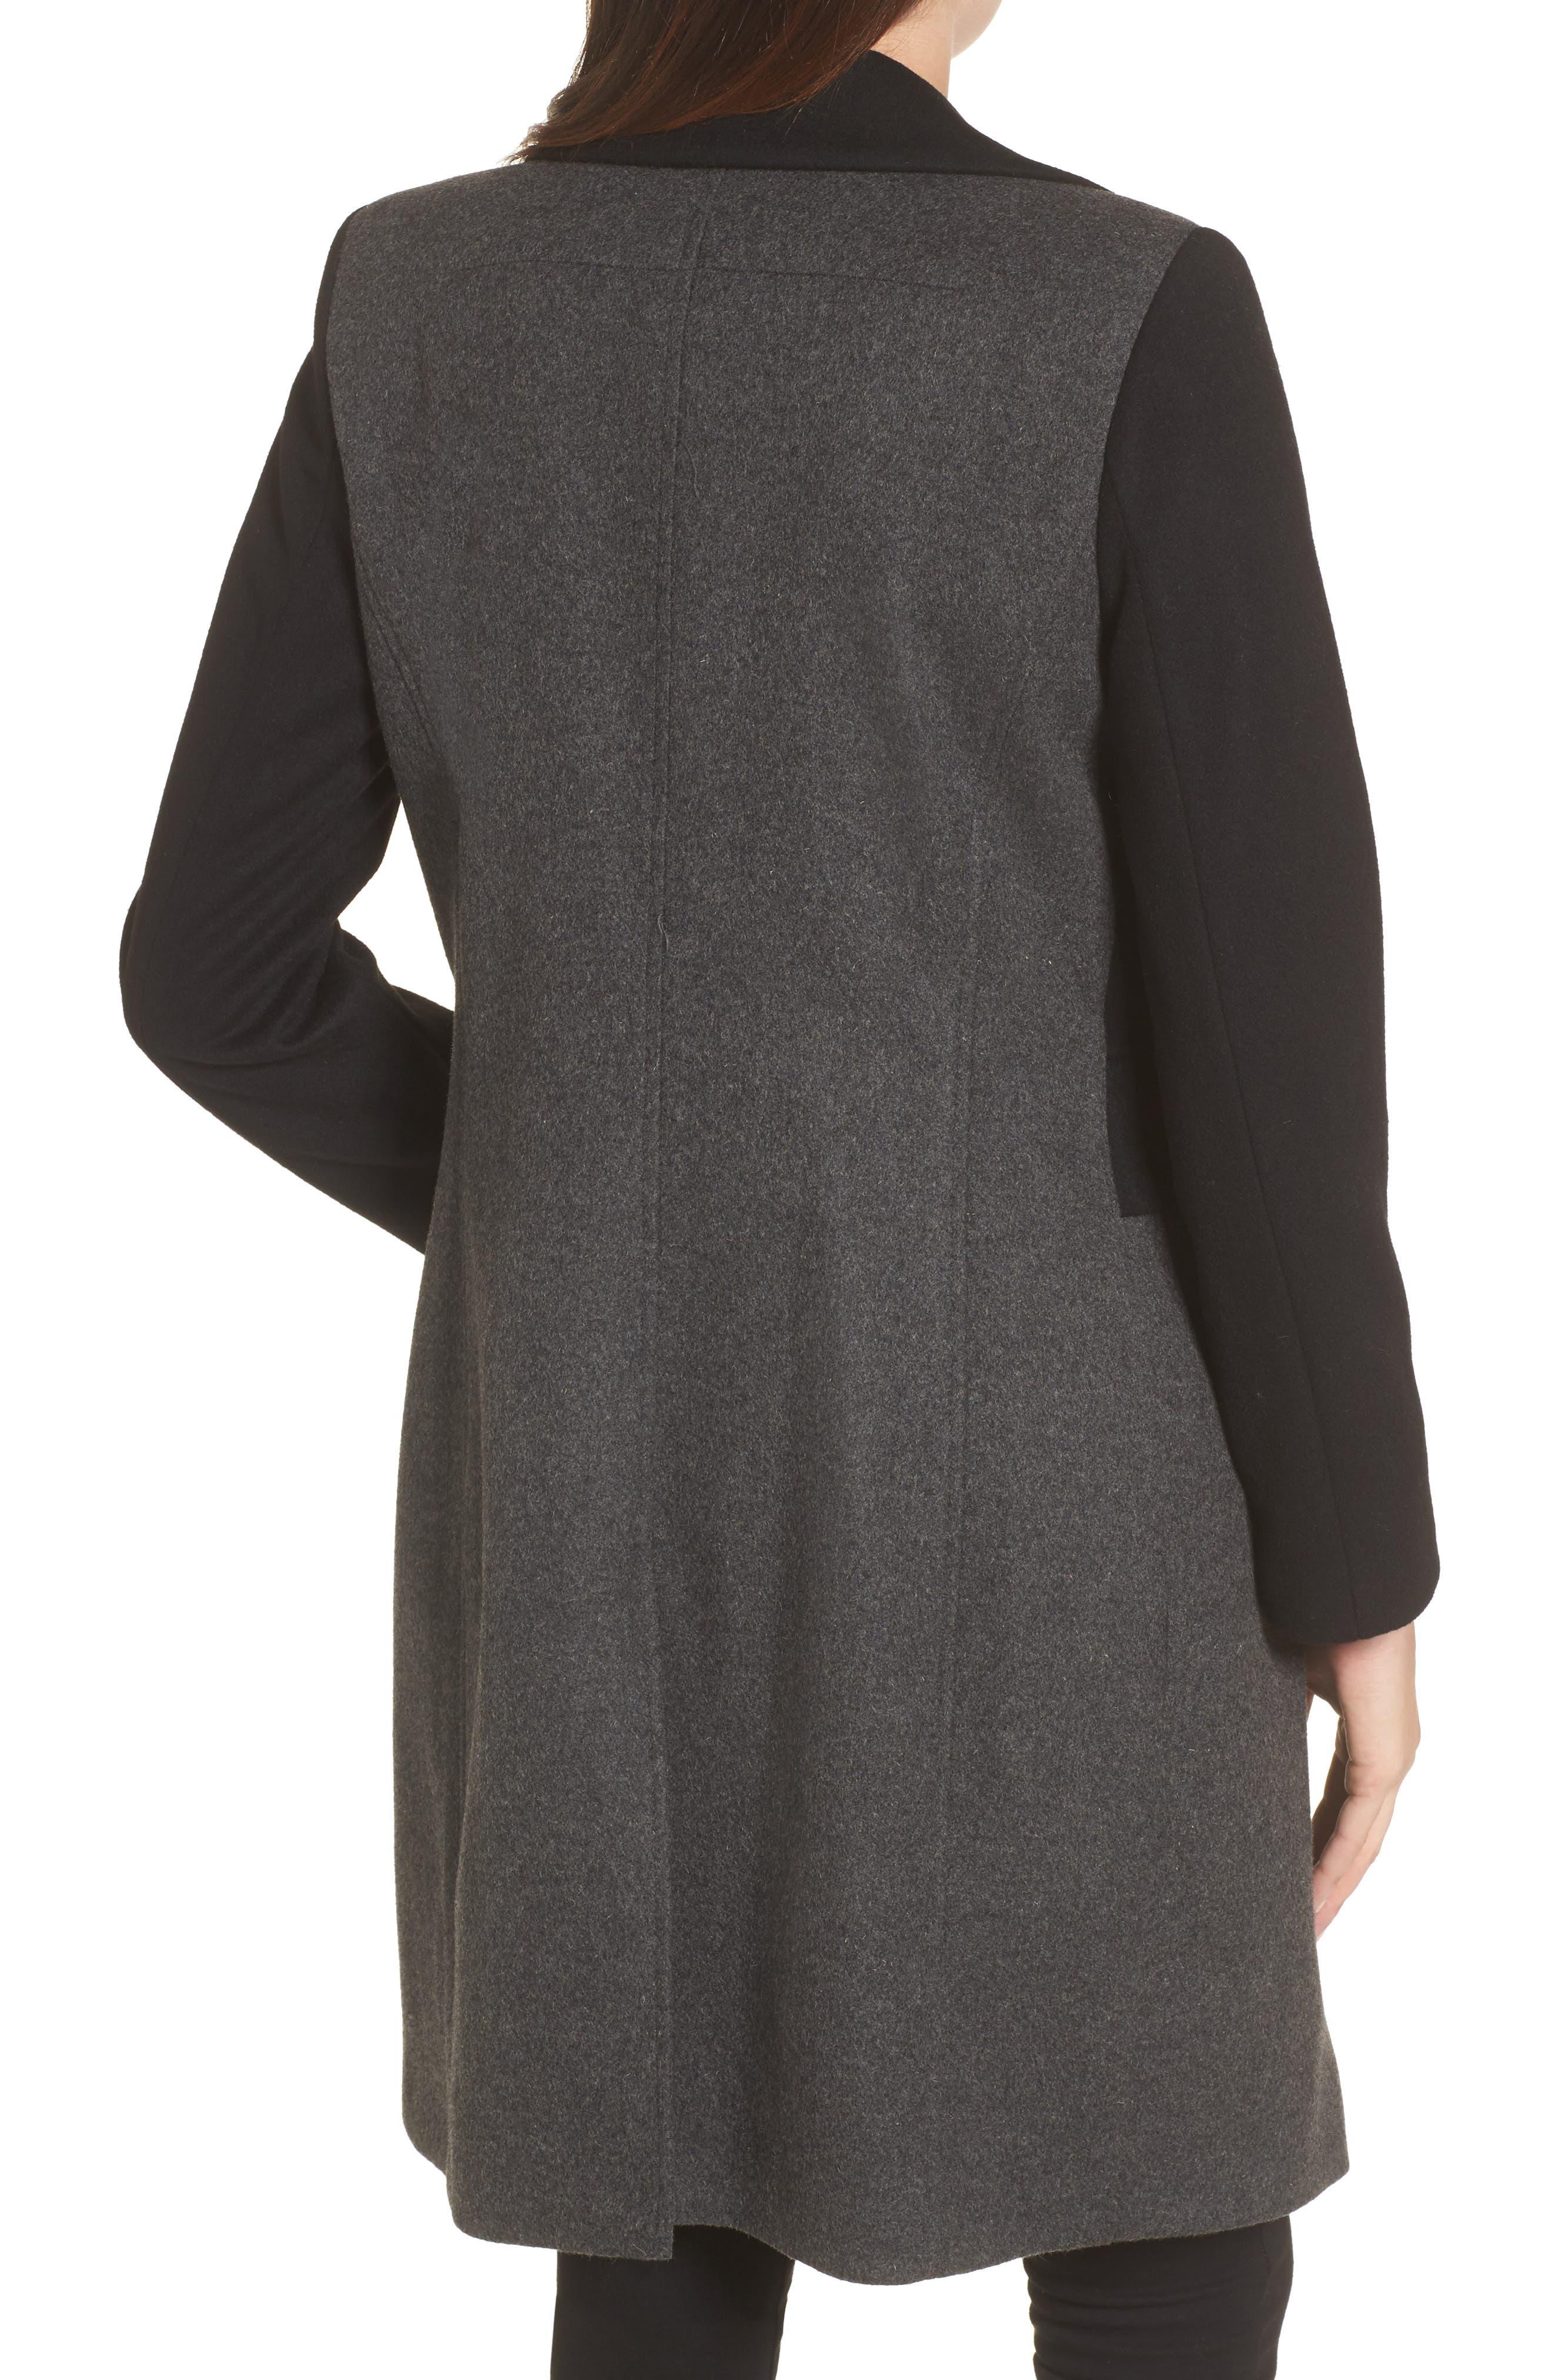 Brooklyn Colorblock Coat,                             Alternate thumbnail 2, color,                             Grey/ Black